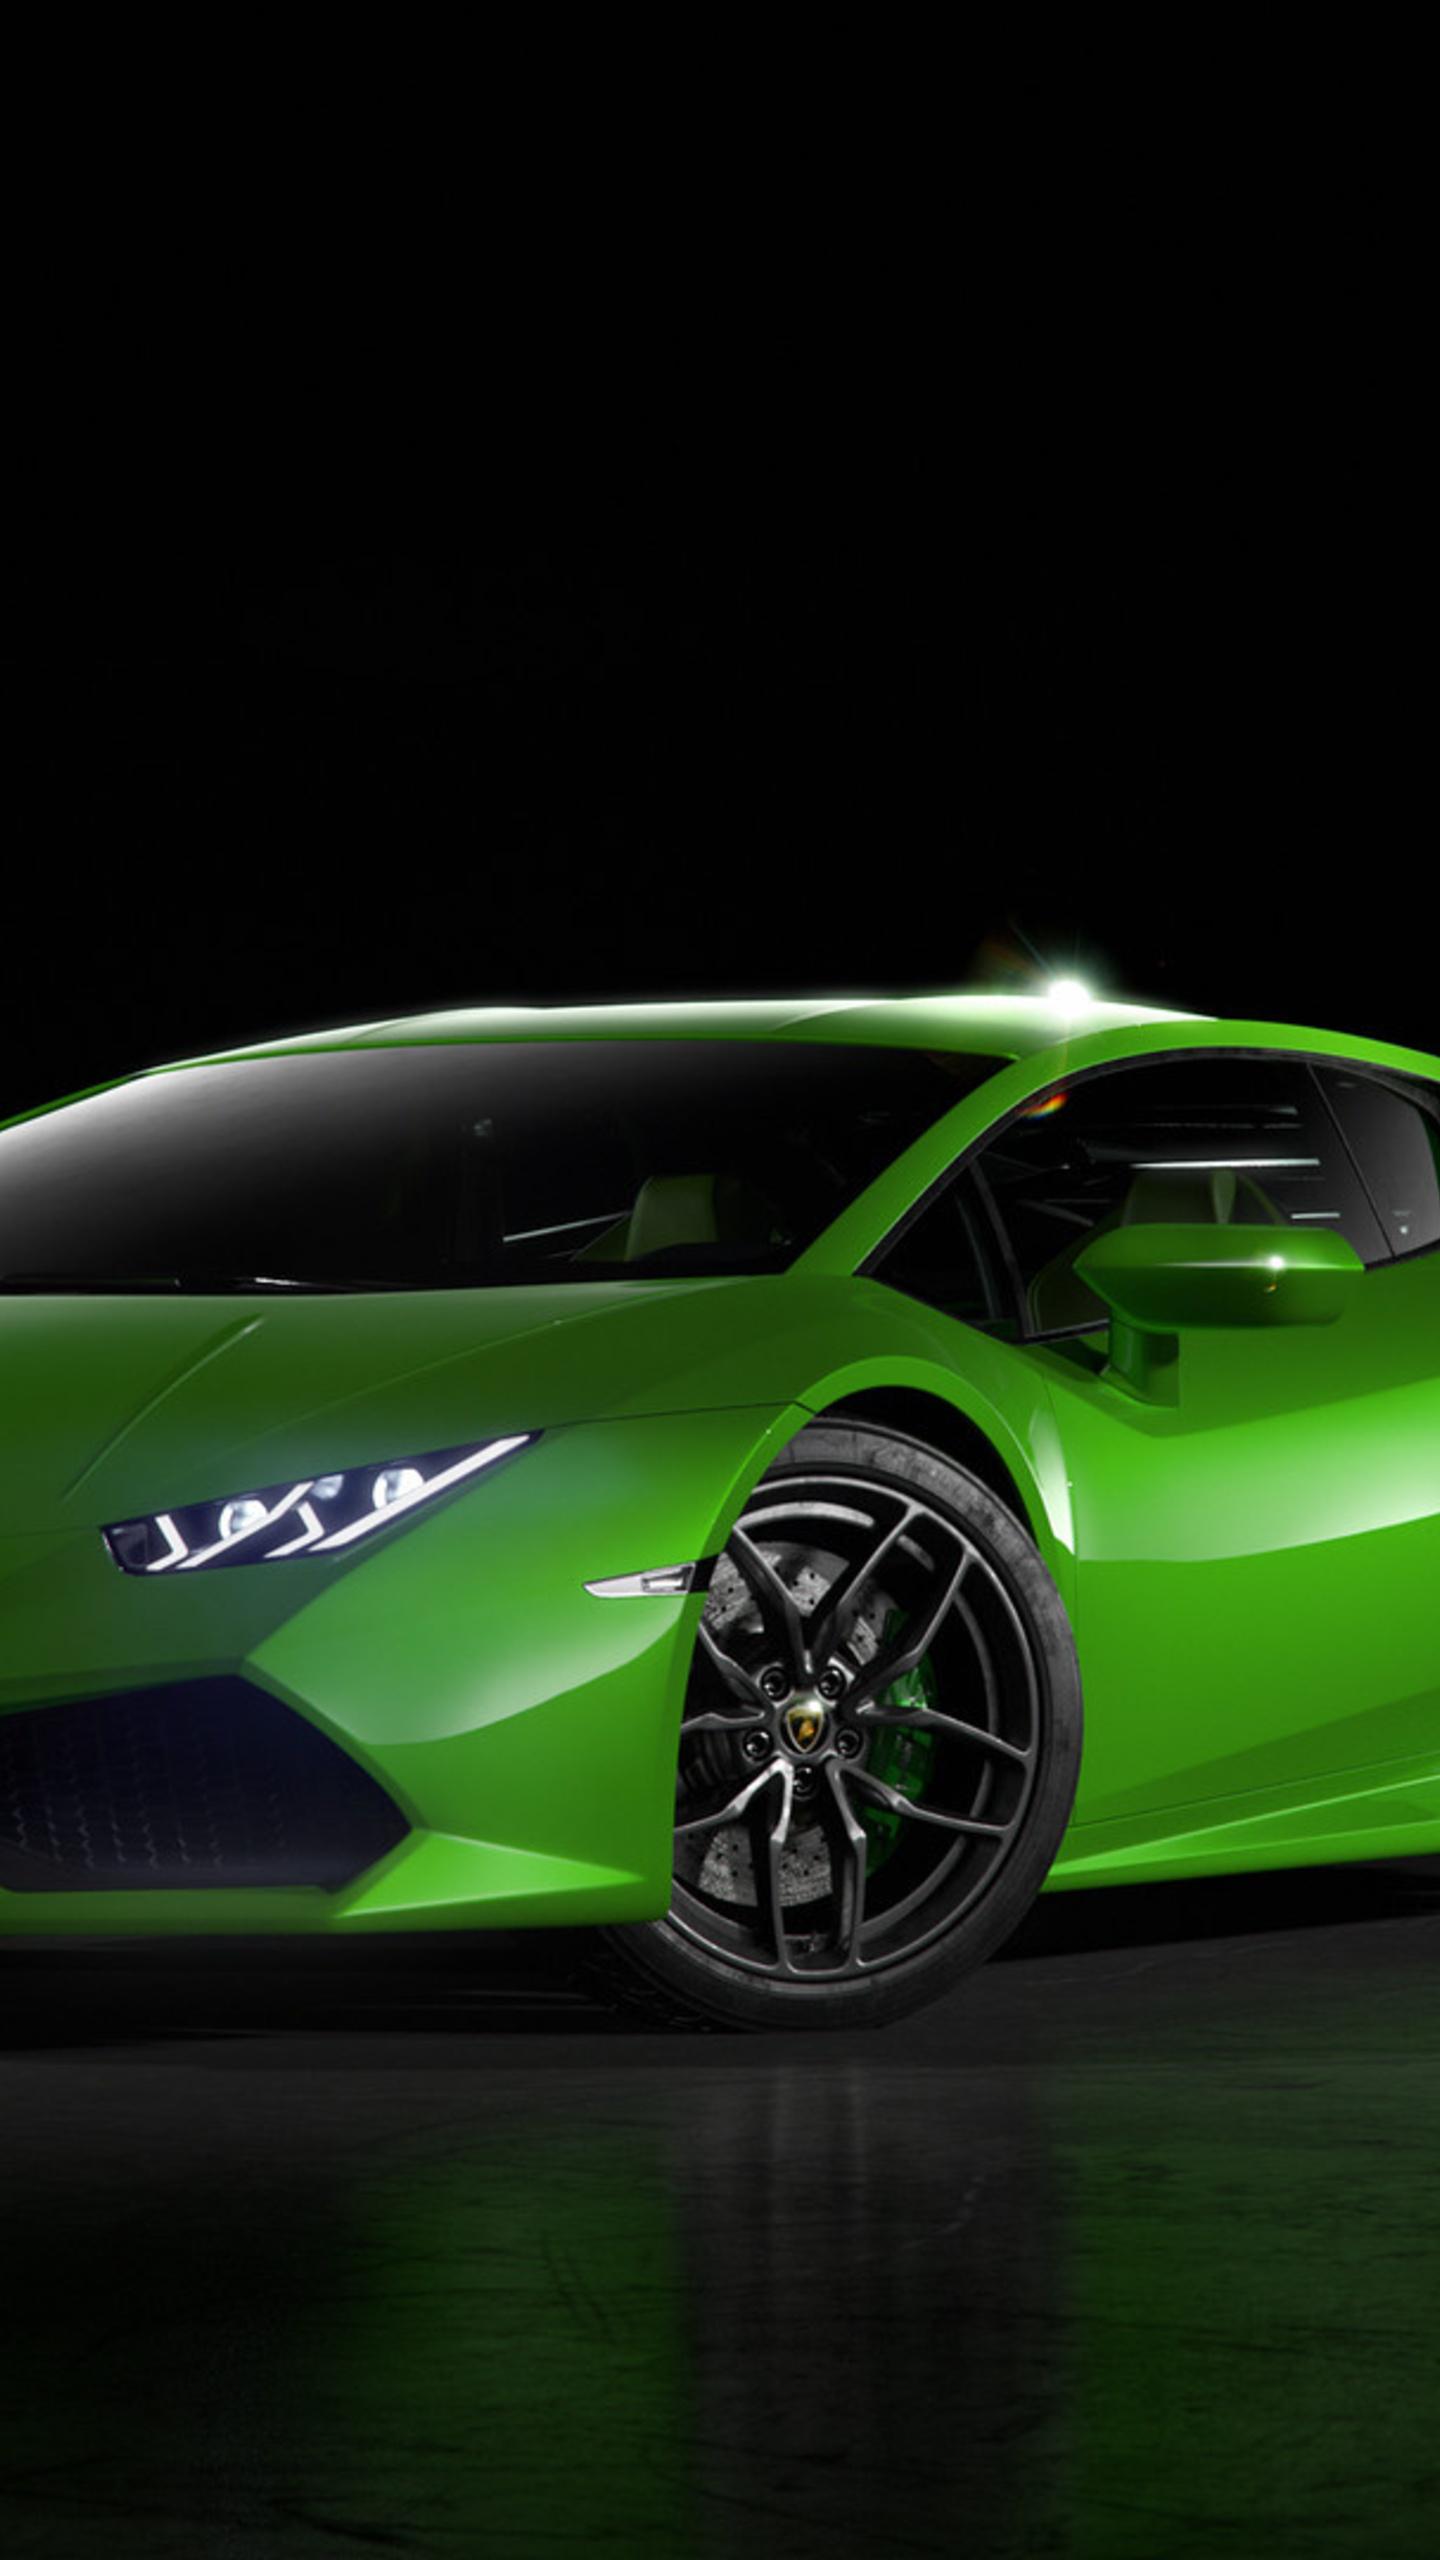 1440x2560 Green Lamborghini Huracan Front Samsung Galaxy S6 S7